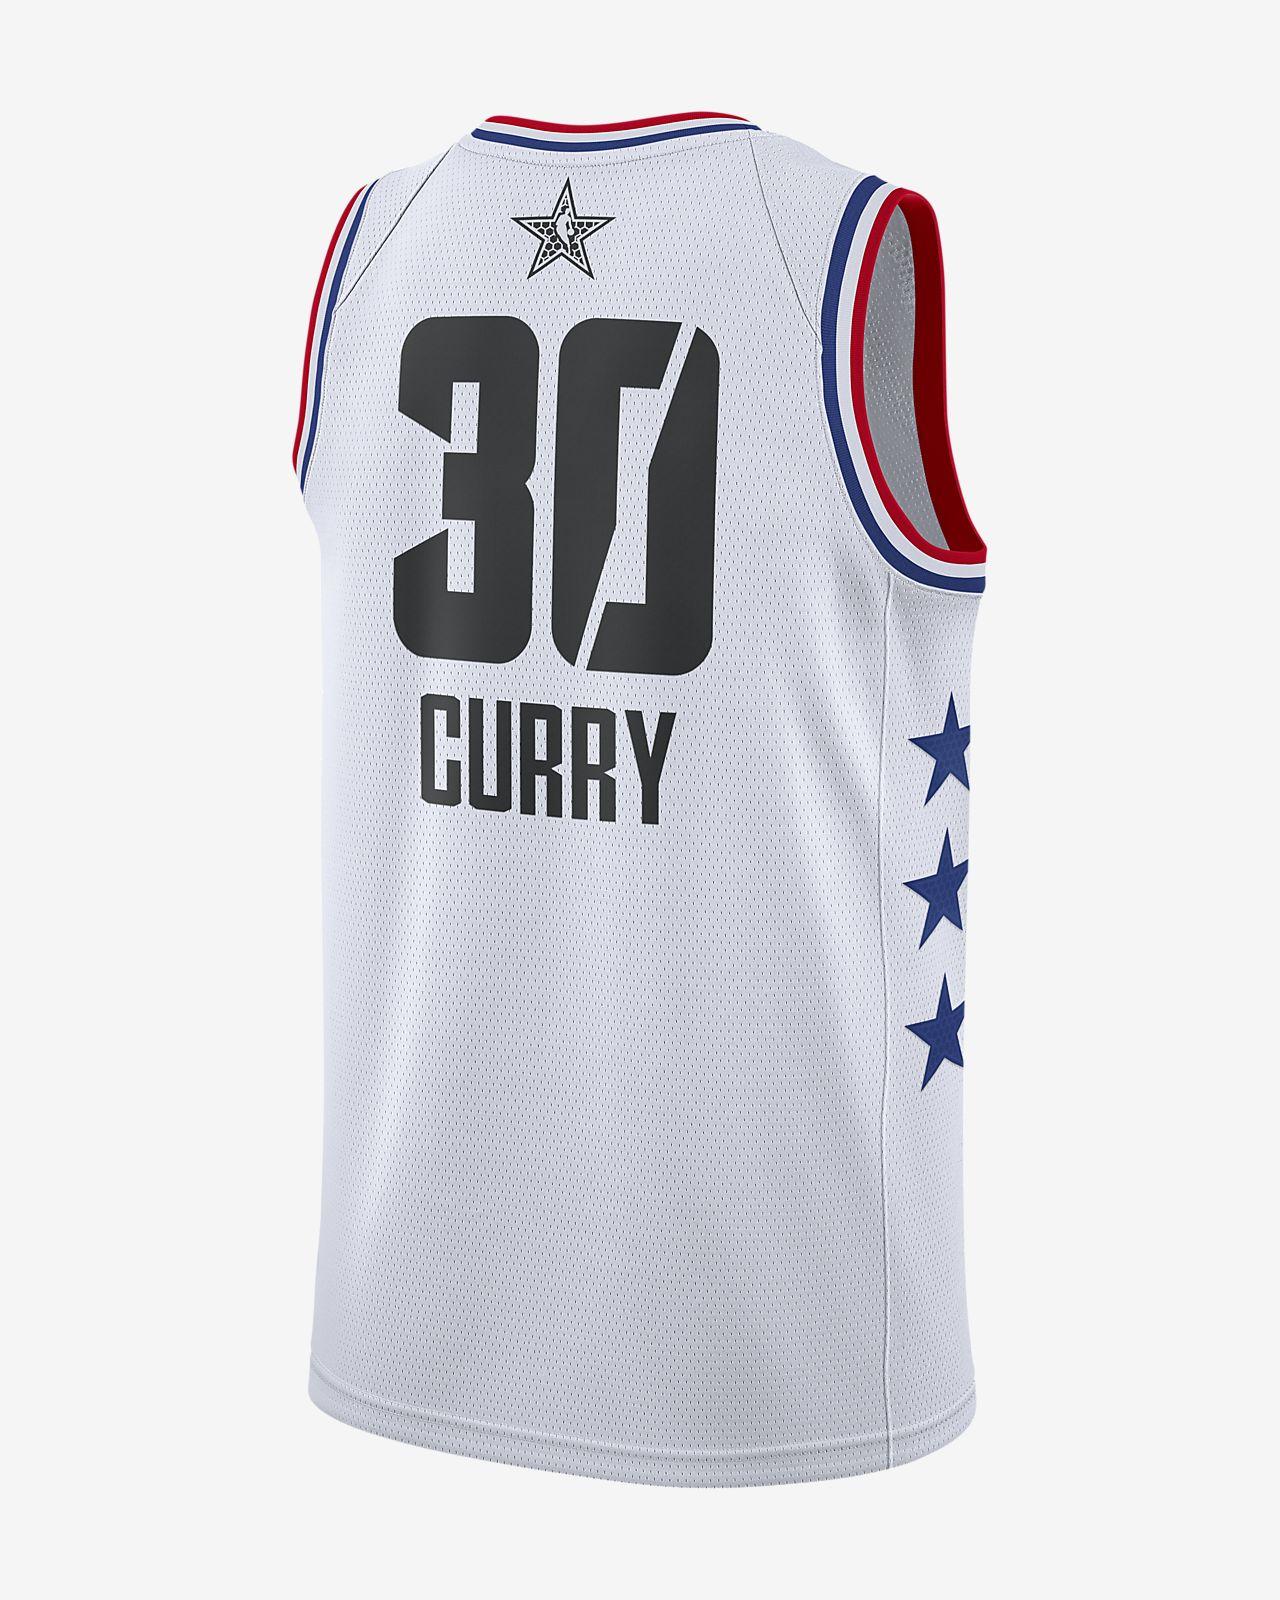 7e80c4602 Men's Jordan NBA Connected Jersey. Stephen Curry All-Star Edition Swingman